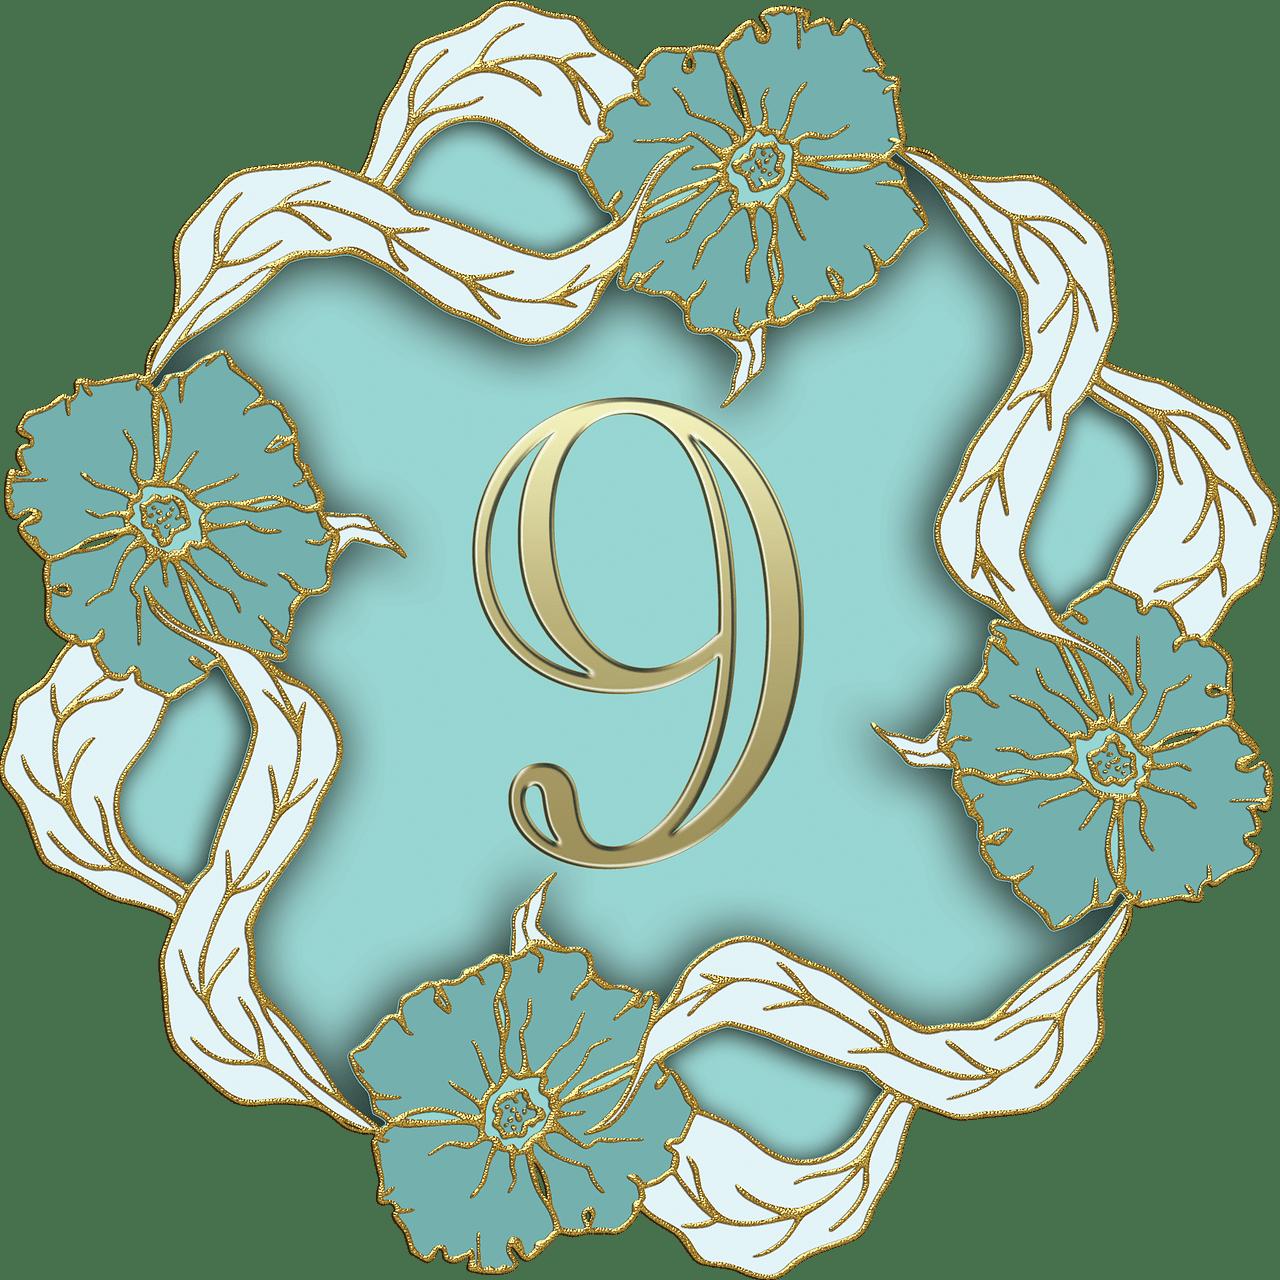 Aqua flower clipart banner freeuse stock Flower Theme Number 9 transparent PNG - StickPNG banner freeuse stock